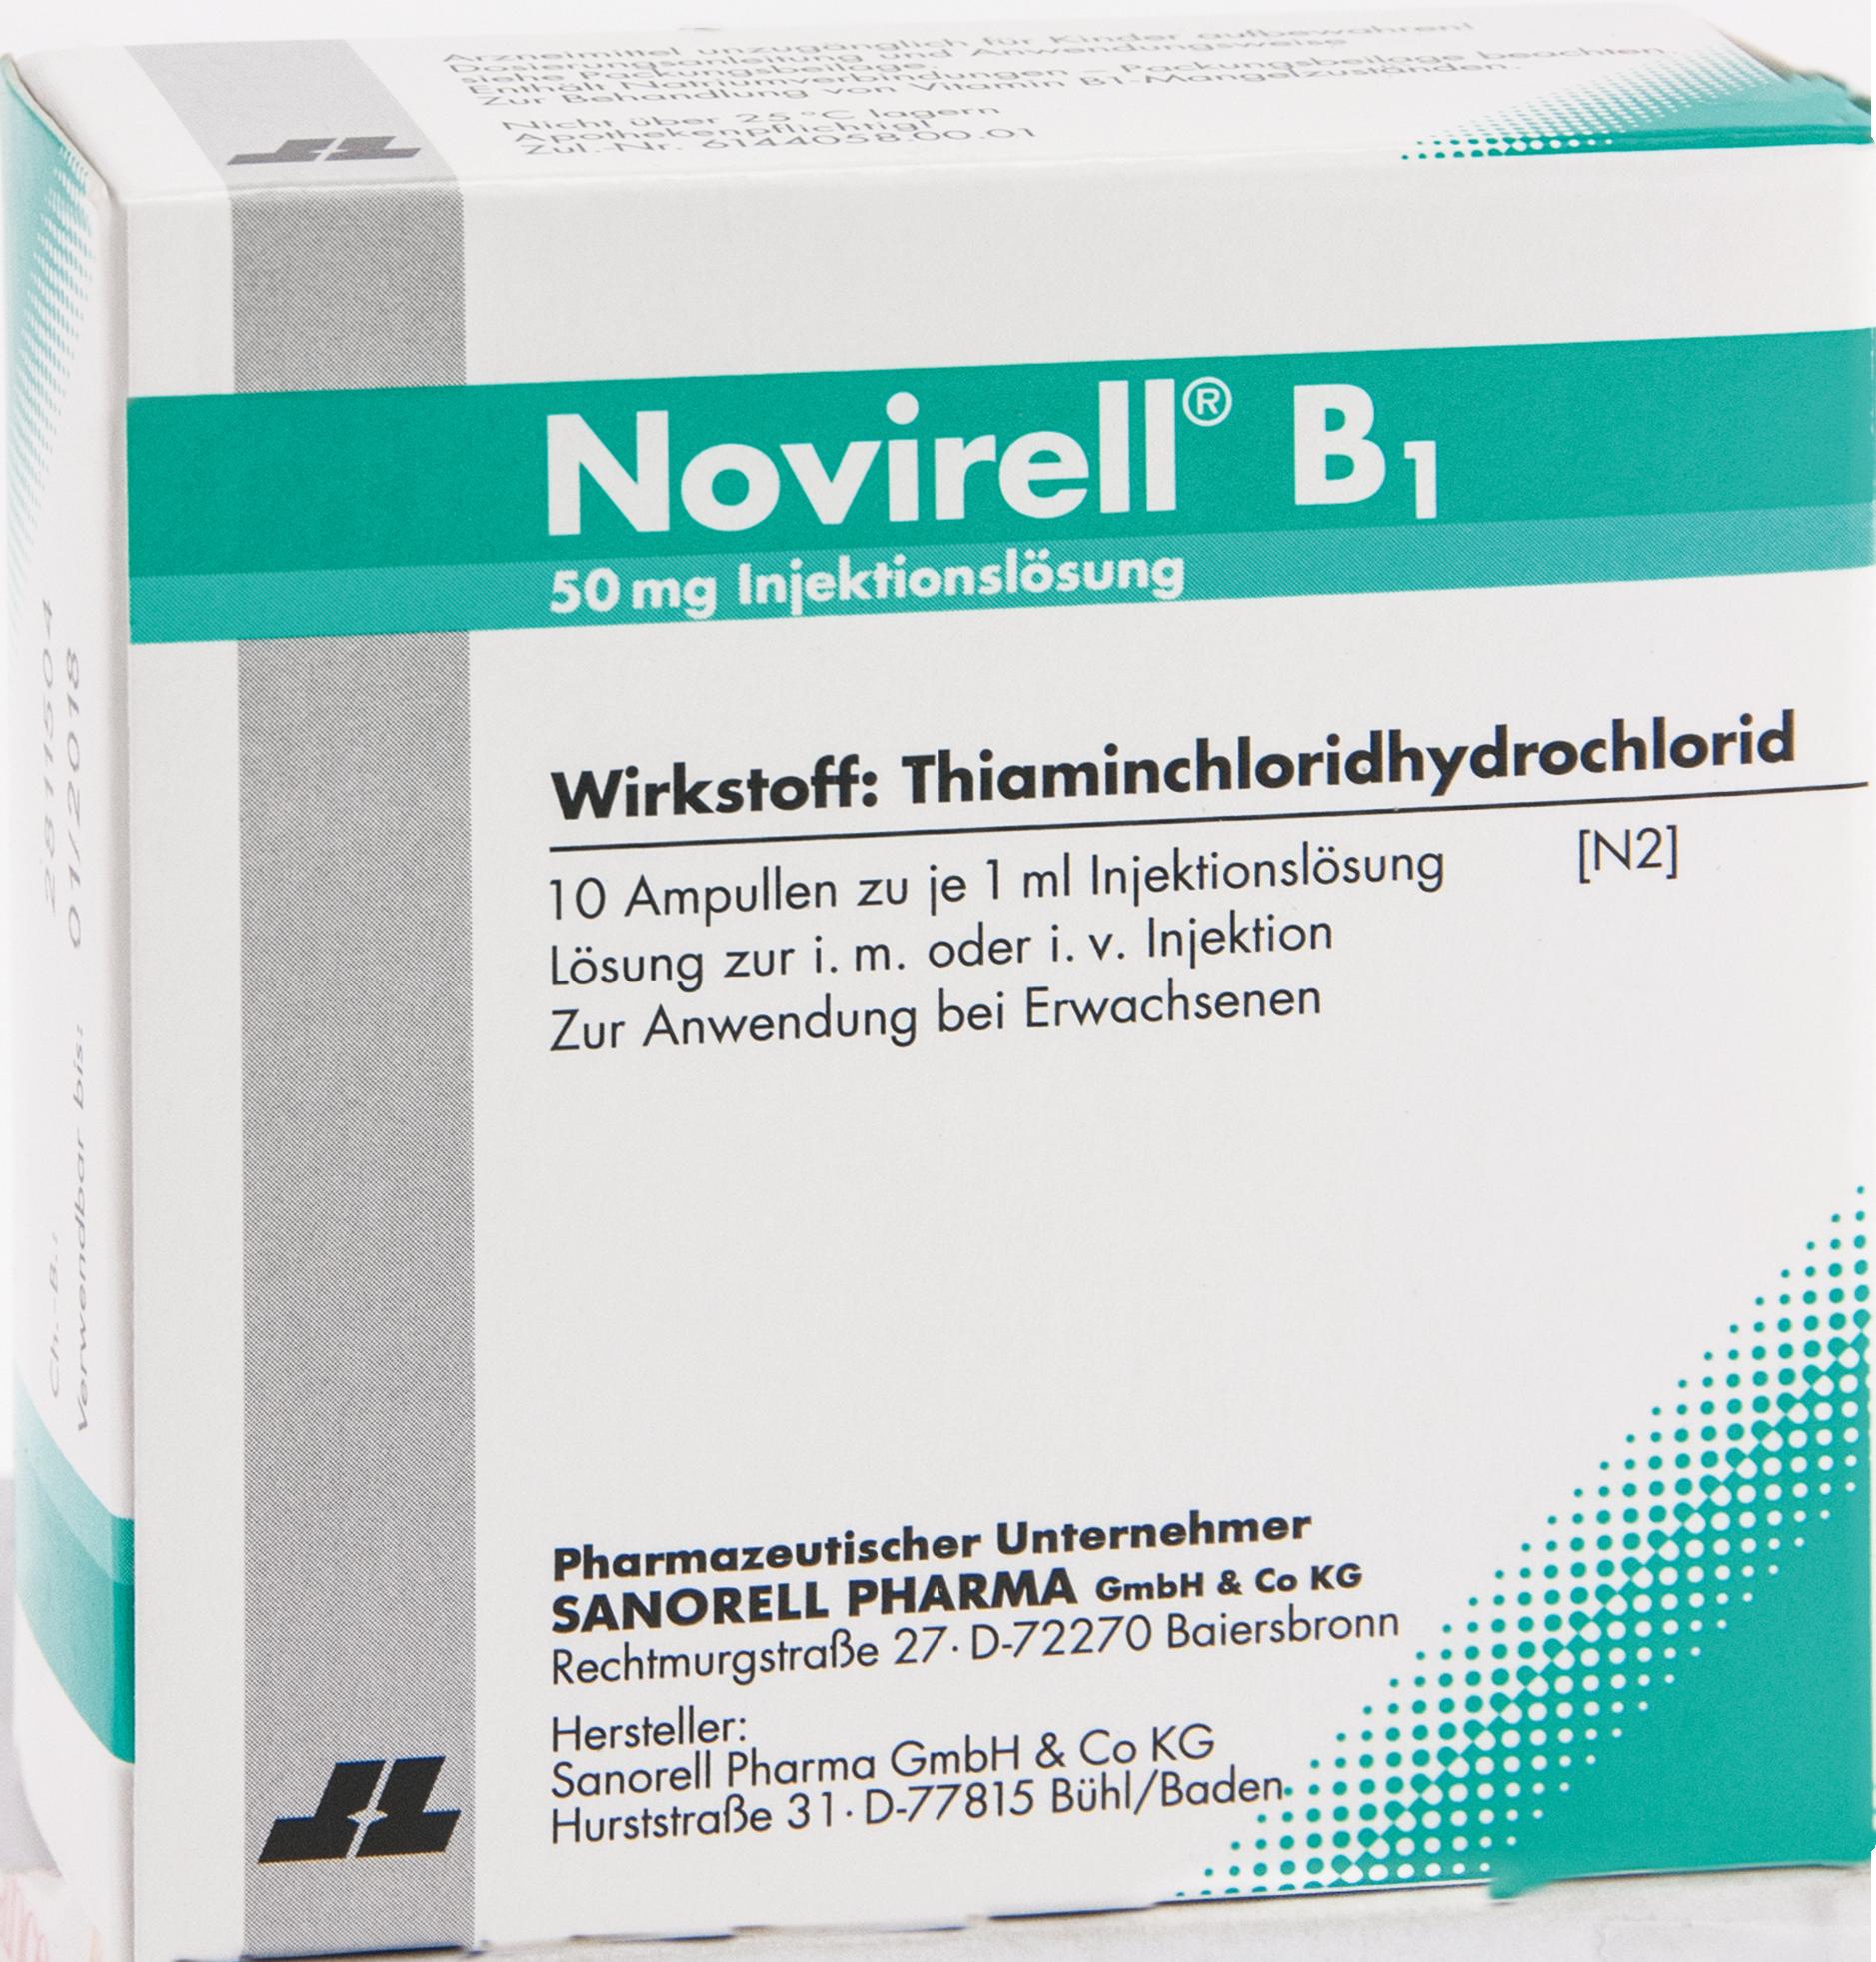 Novirell B1 50mg Injektionslösung